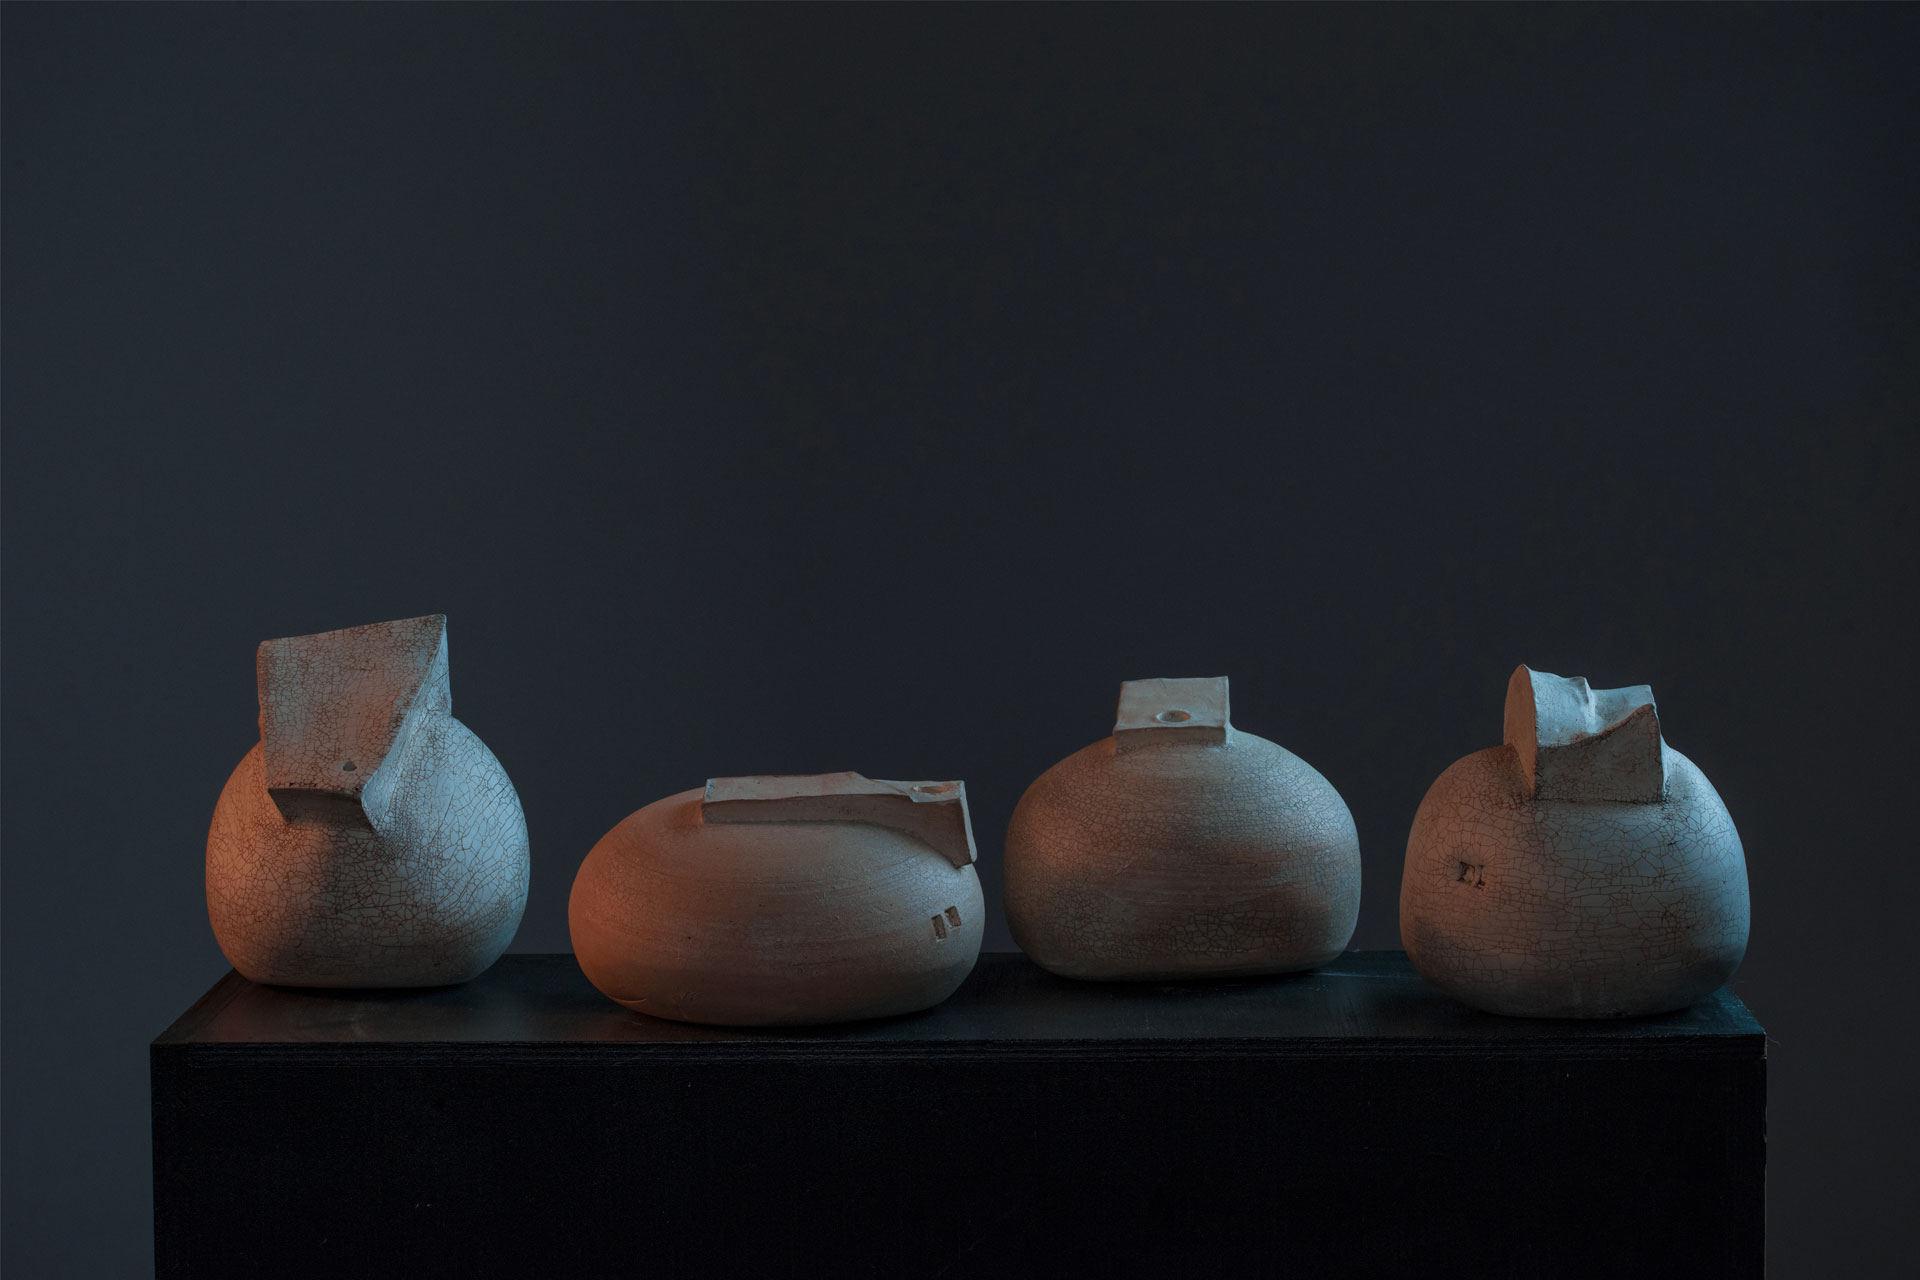 gallery-101-seung-jun-seo-ceramics-artist-asheville-north-carolina-3.jpg